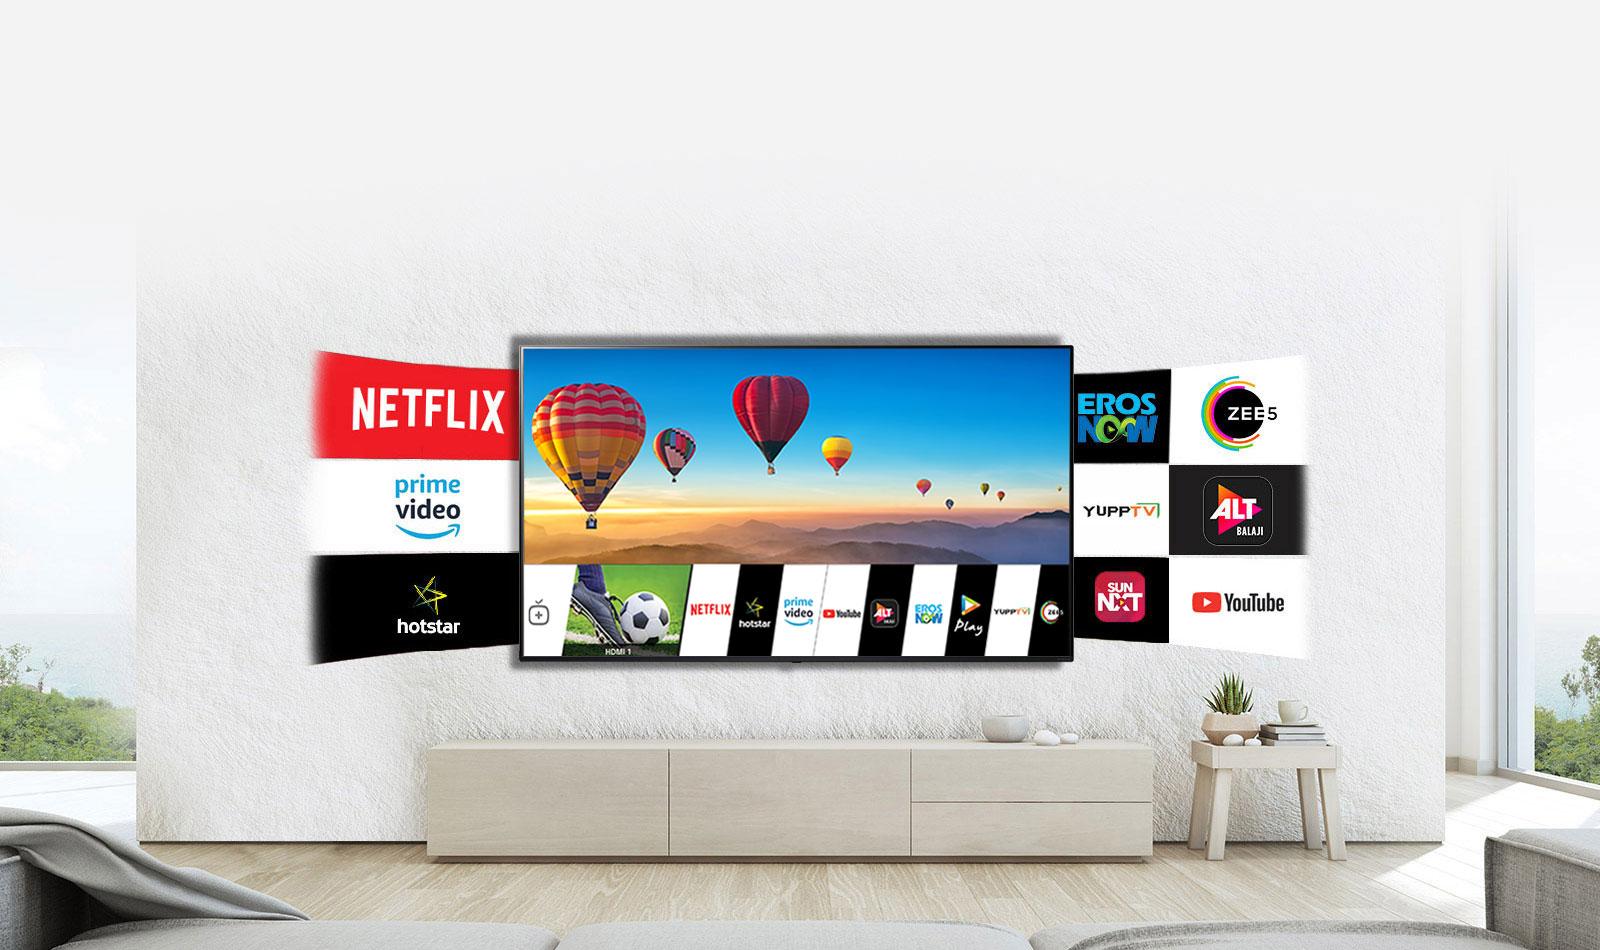 LG NanoCell TV AI ThinQ